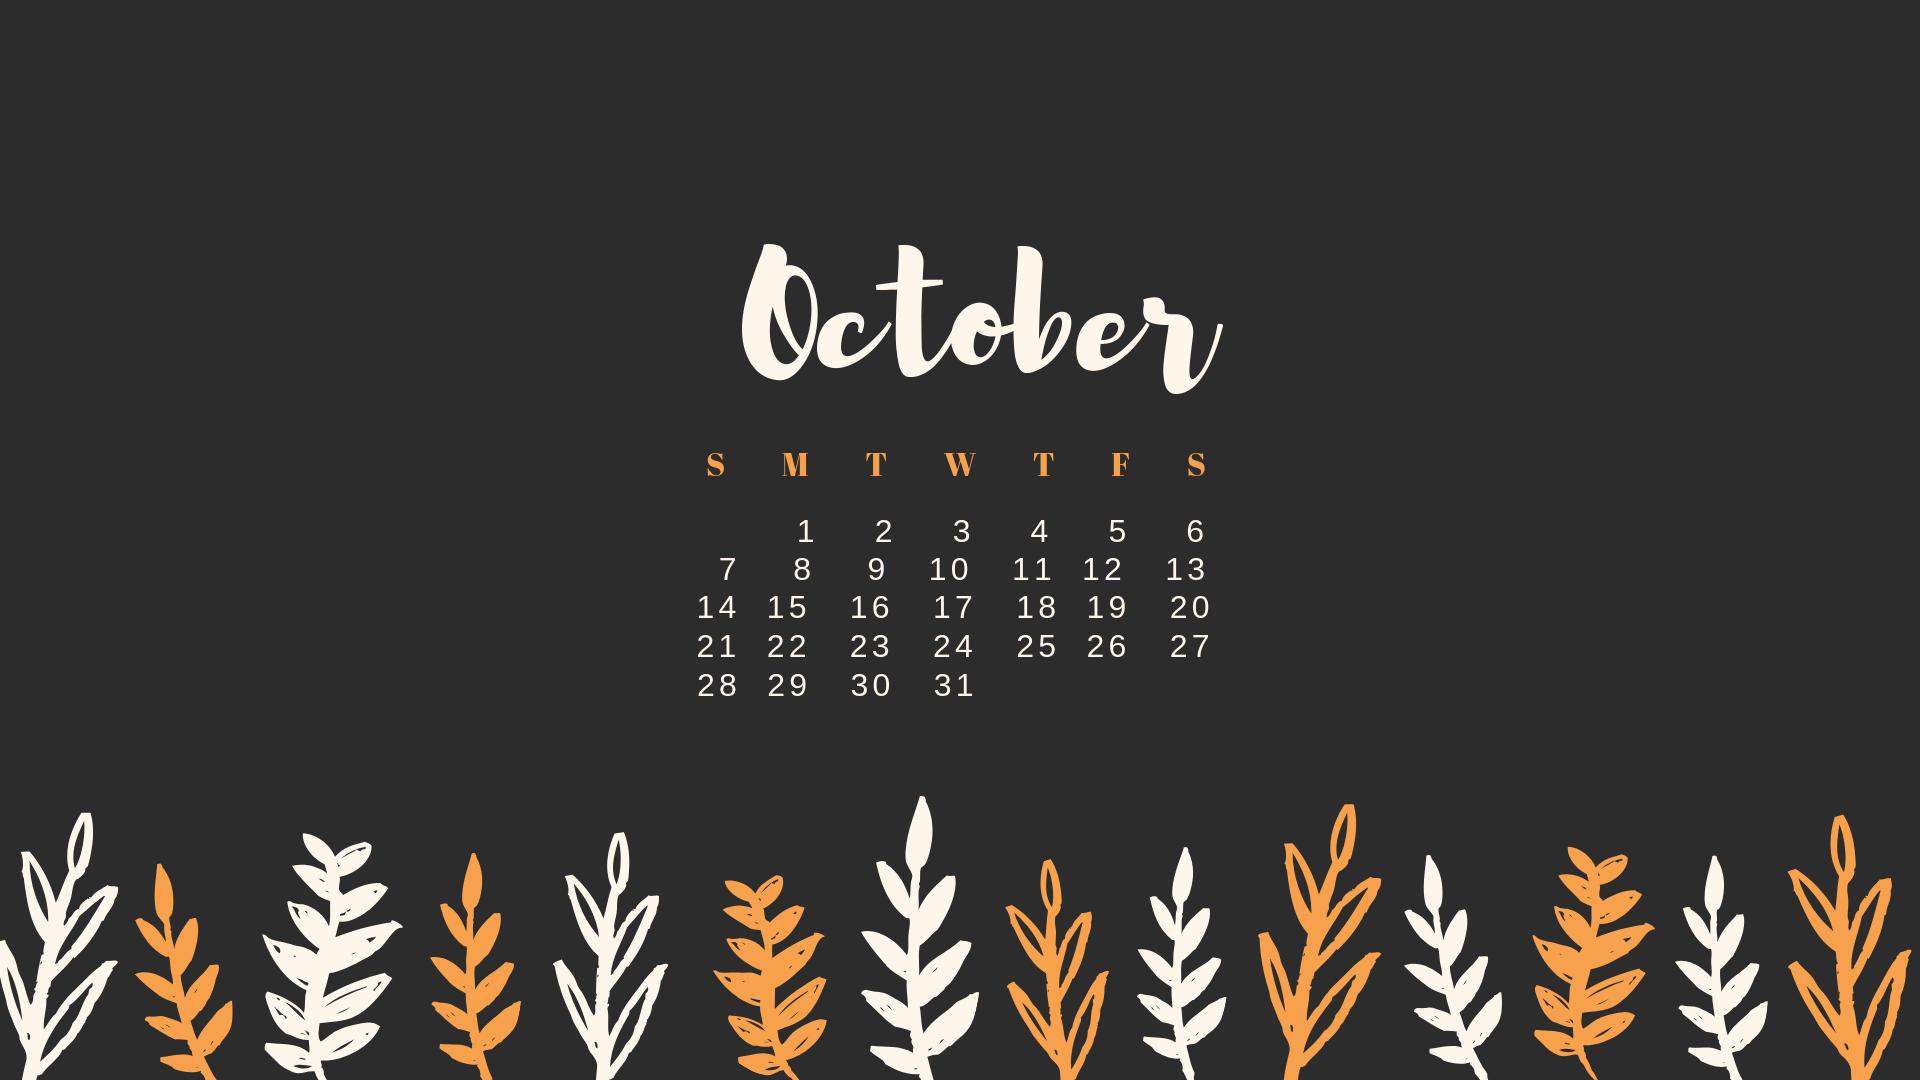 Download October Calendars Wallpapers Blog 1920x1080